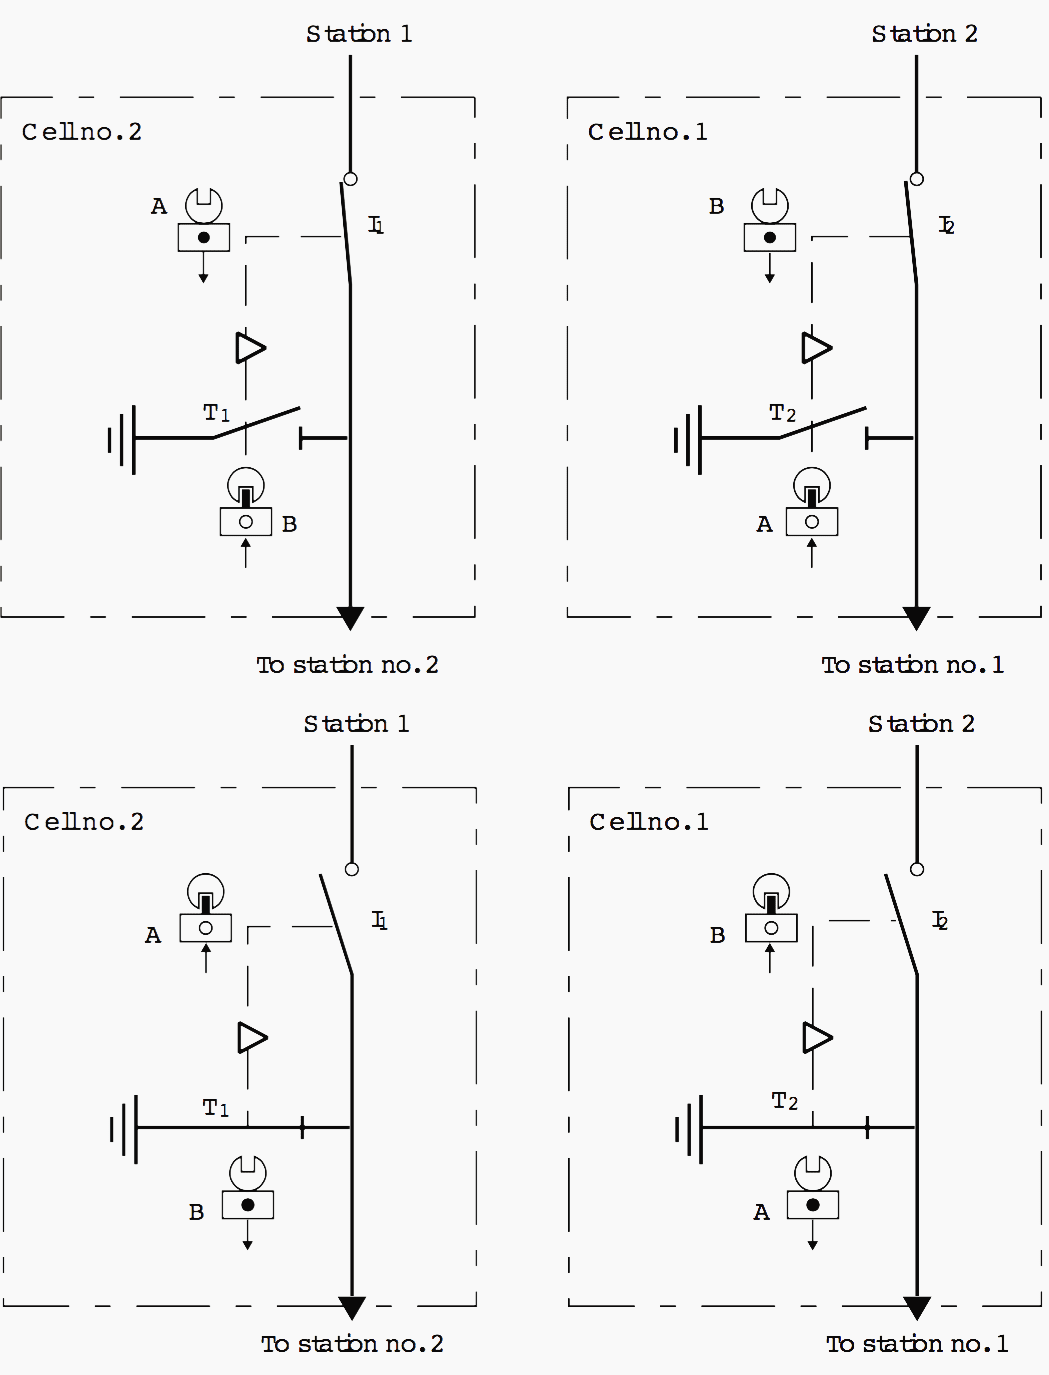 Locking cells on HV loop system